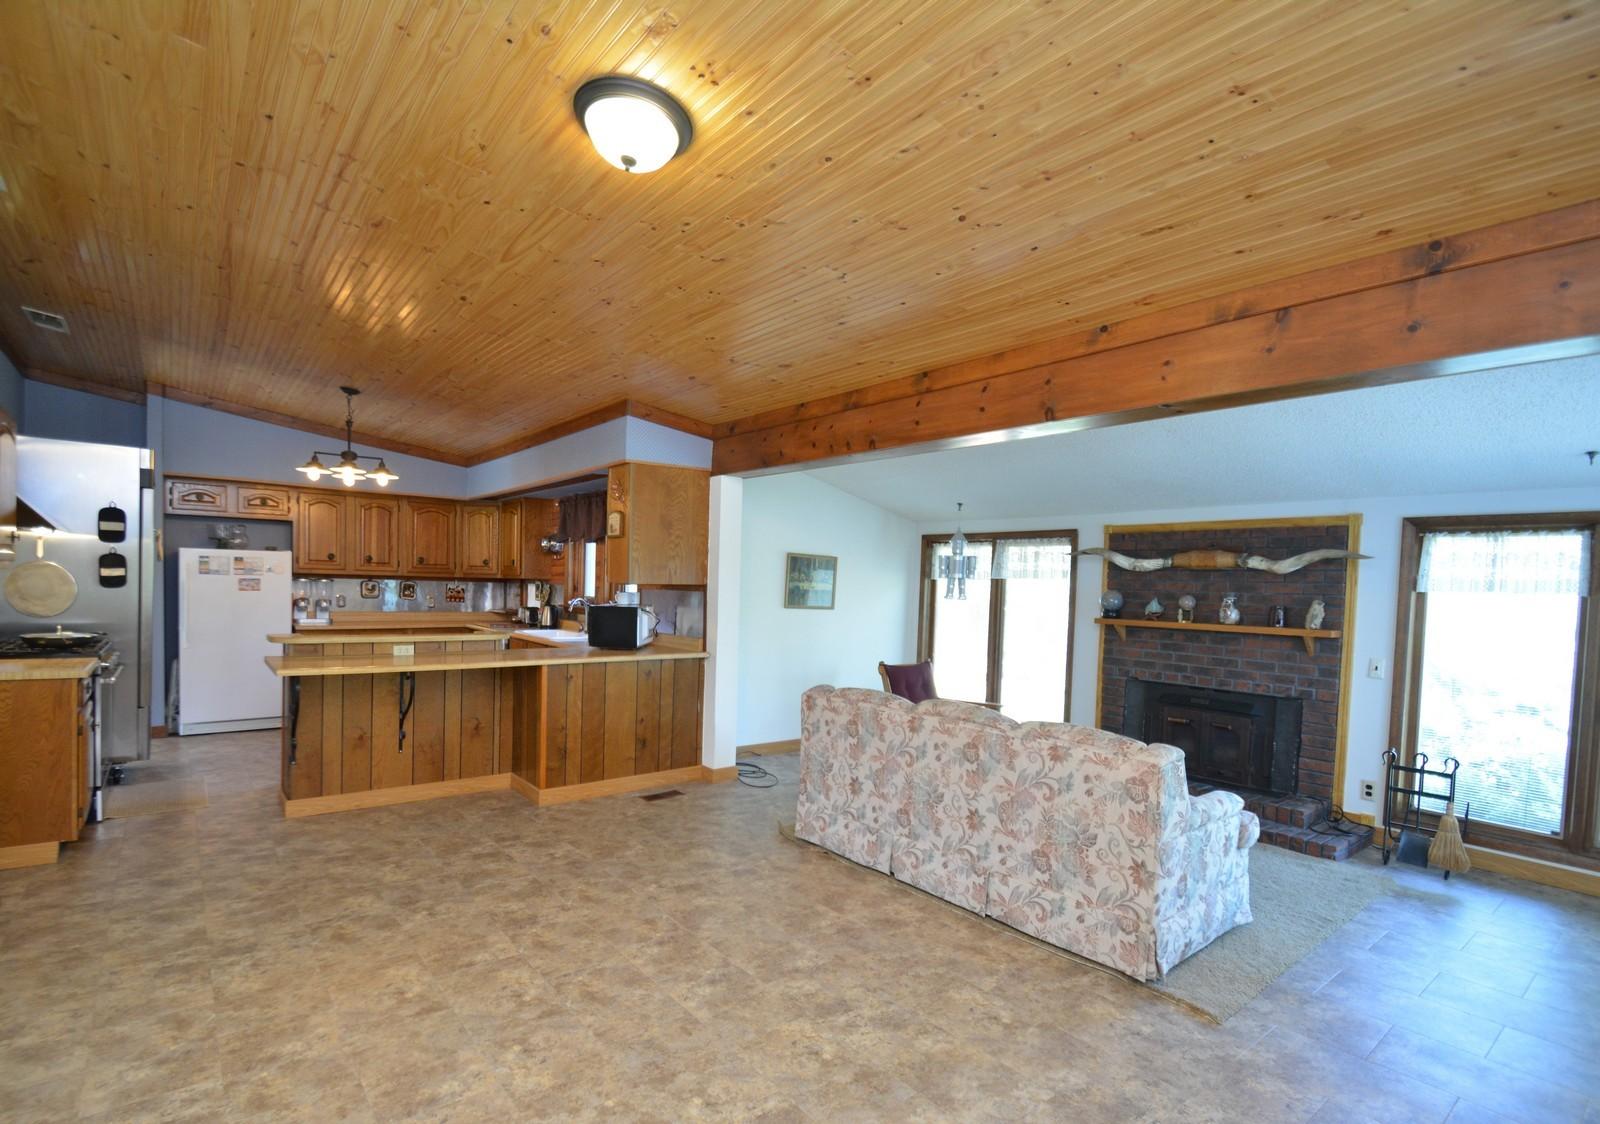 330 W ROAD 270 #1, SCOTT CITY, KS — MLS# 16436 — Coldwell Banker